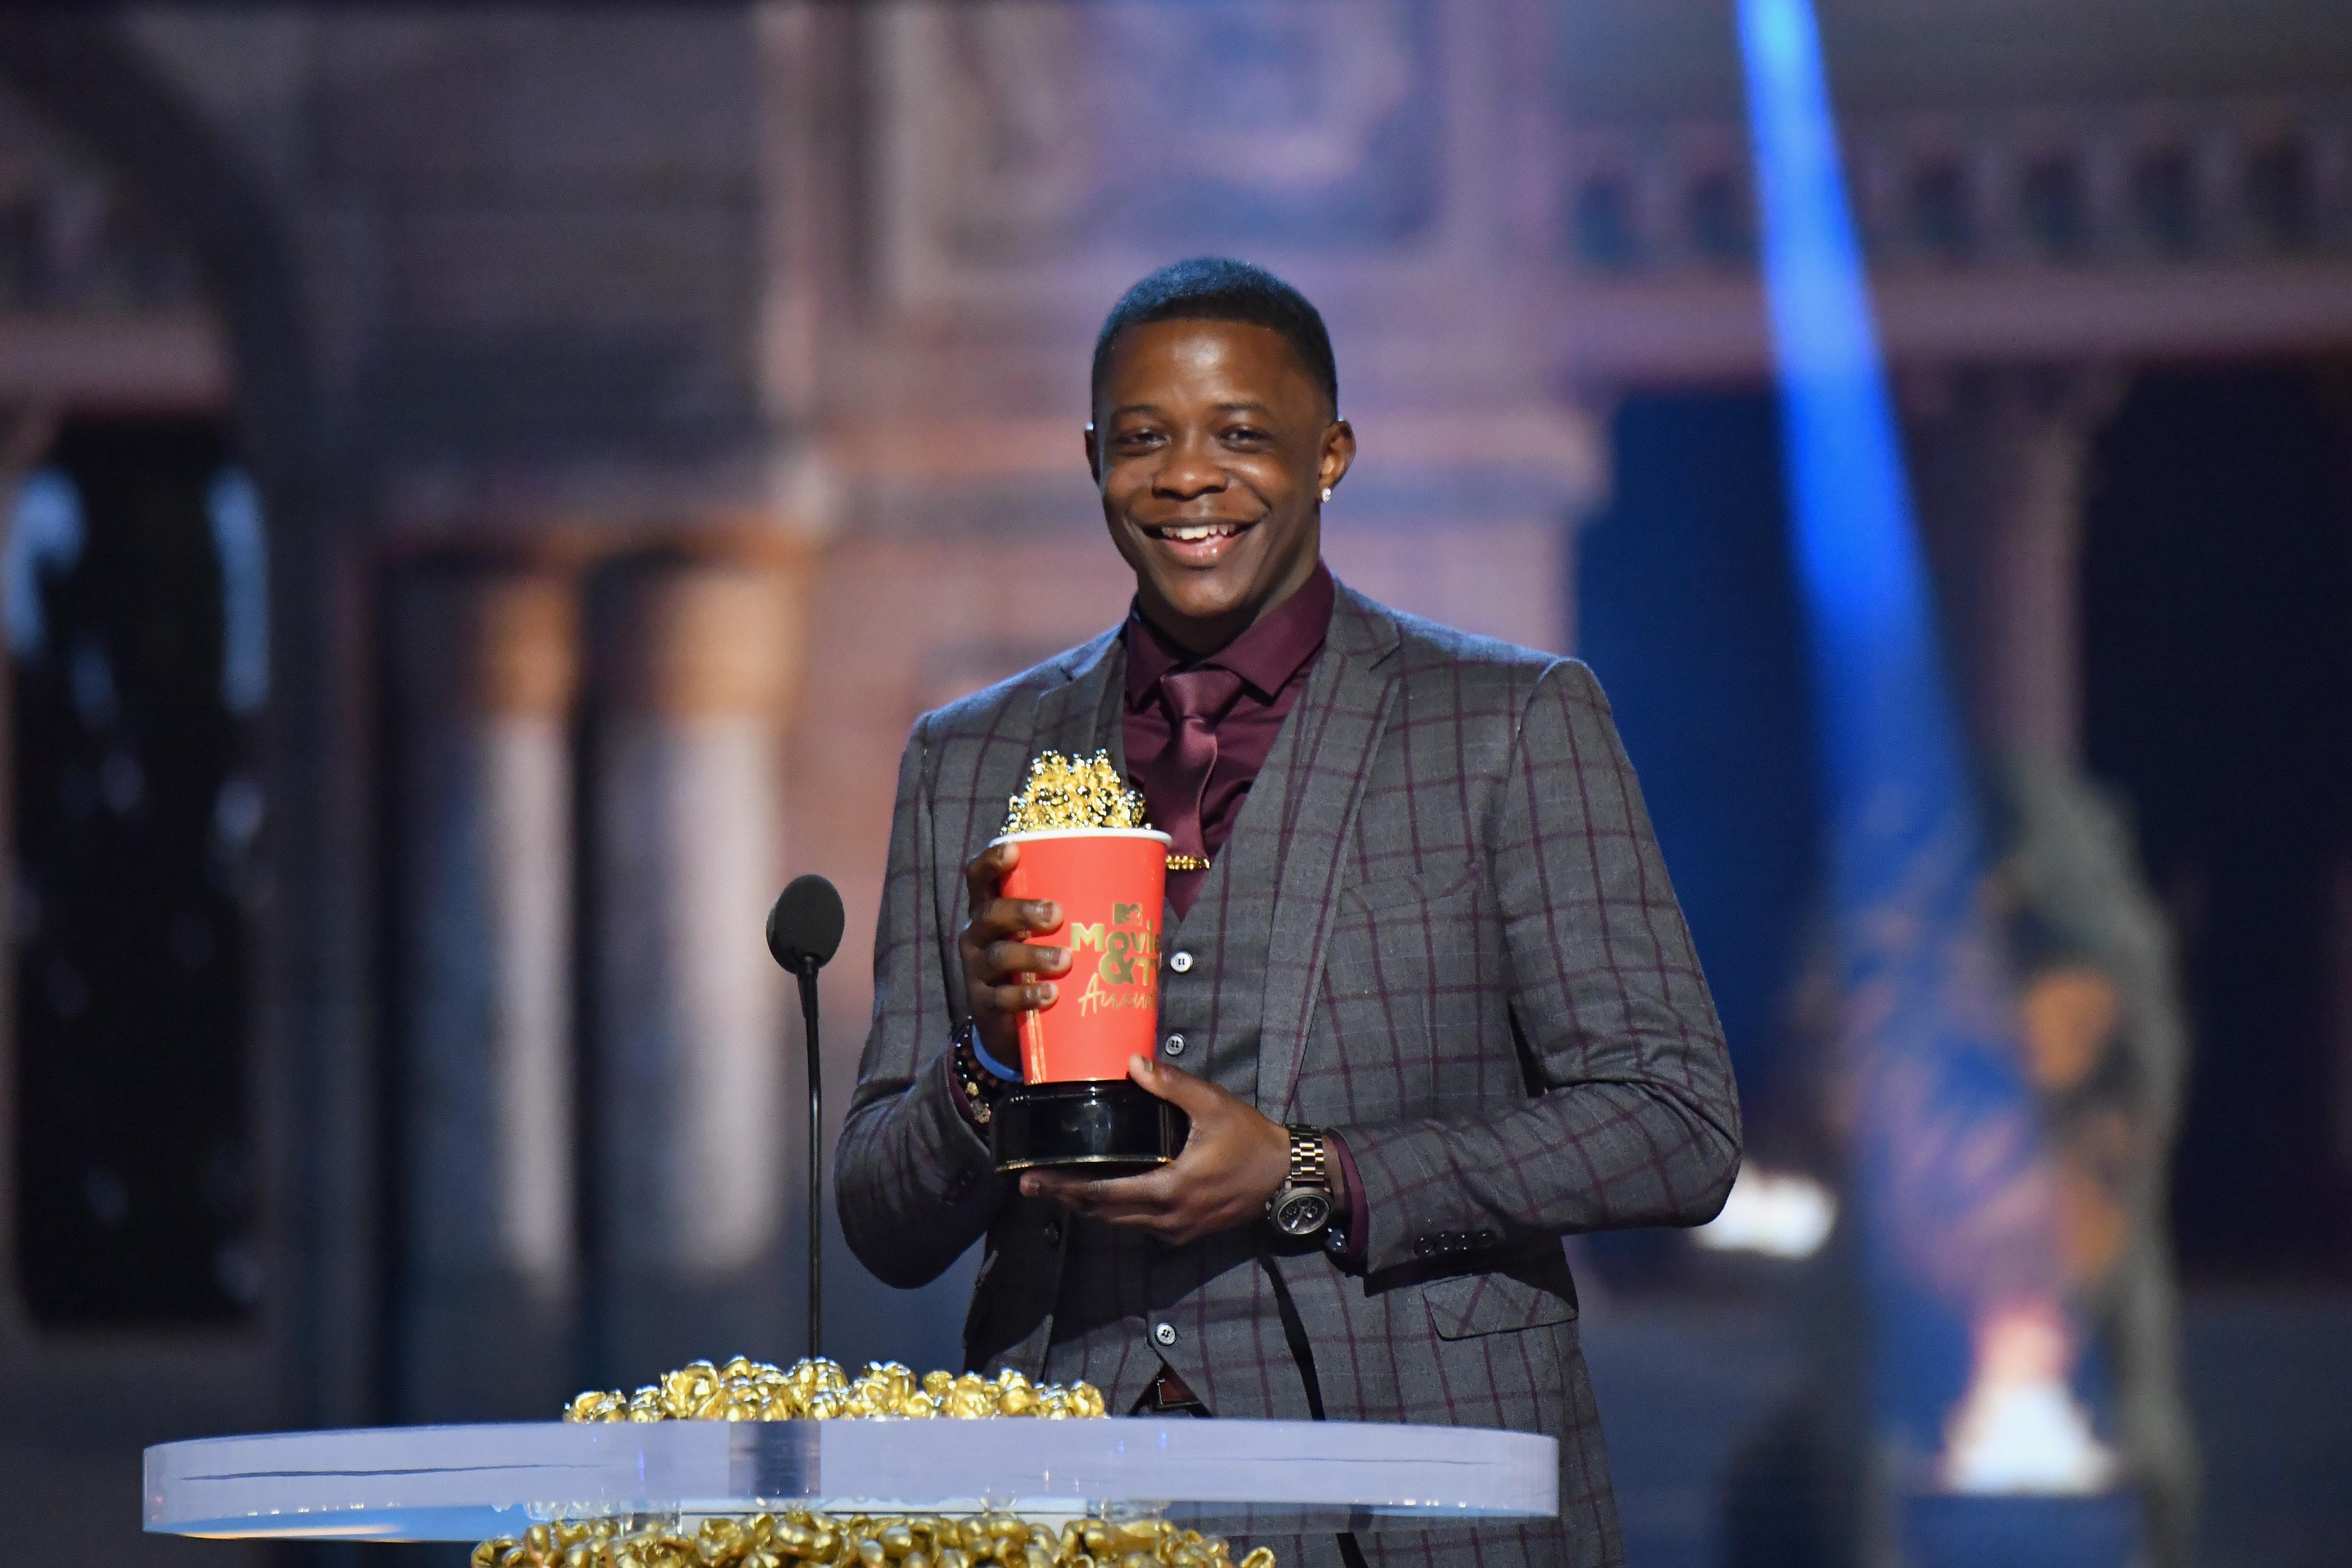 James Shaw Jr. accepts an award onstage at the MTV Movie & TV Awards June 16.